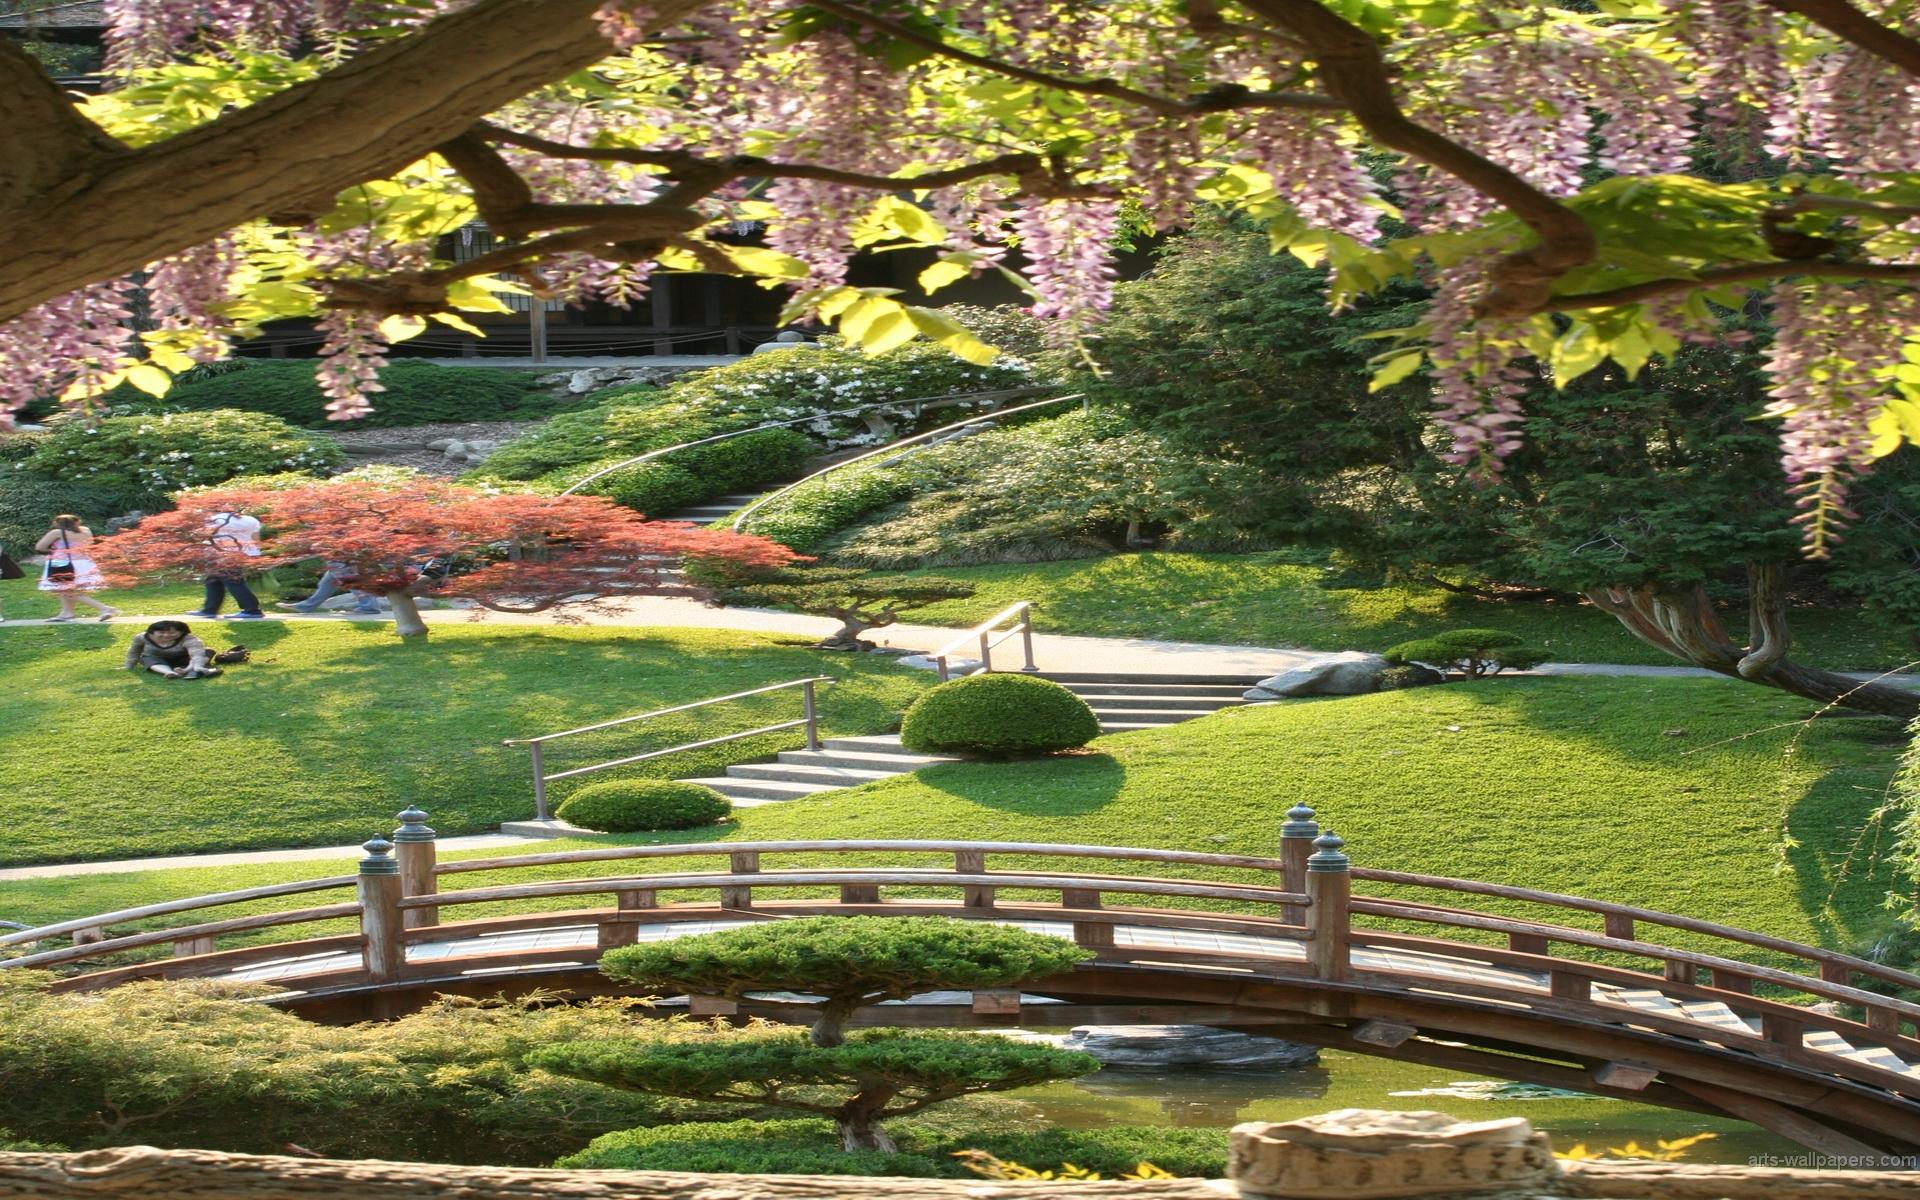 japan garden wallpaper stock - photo #14